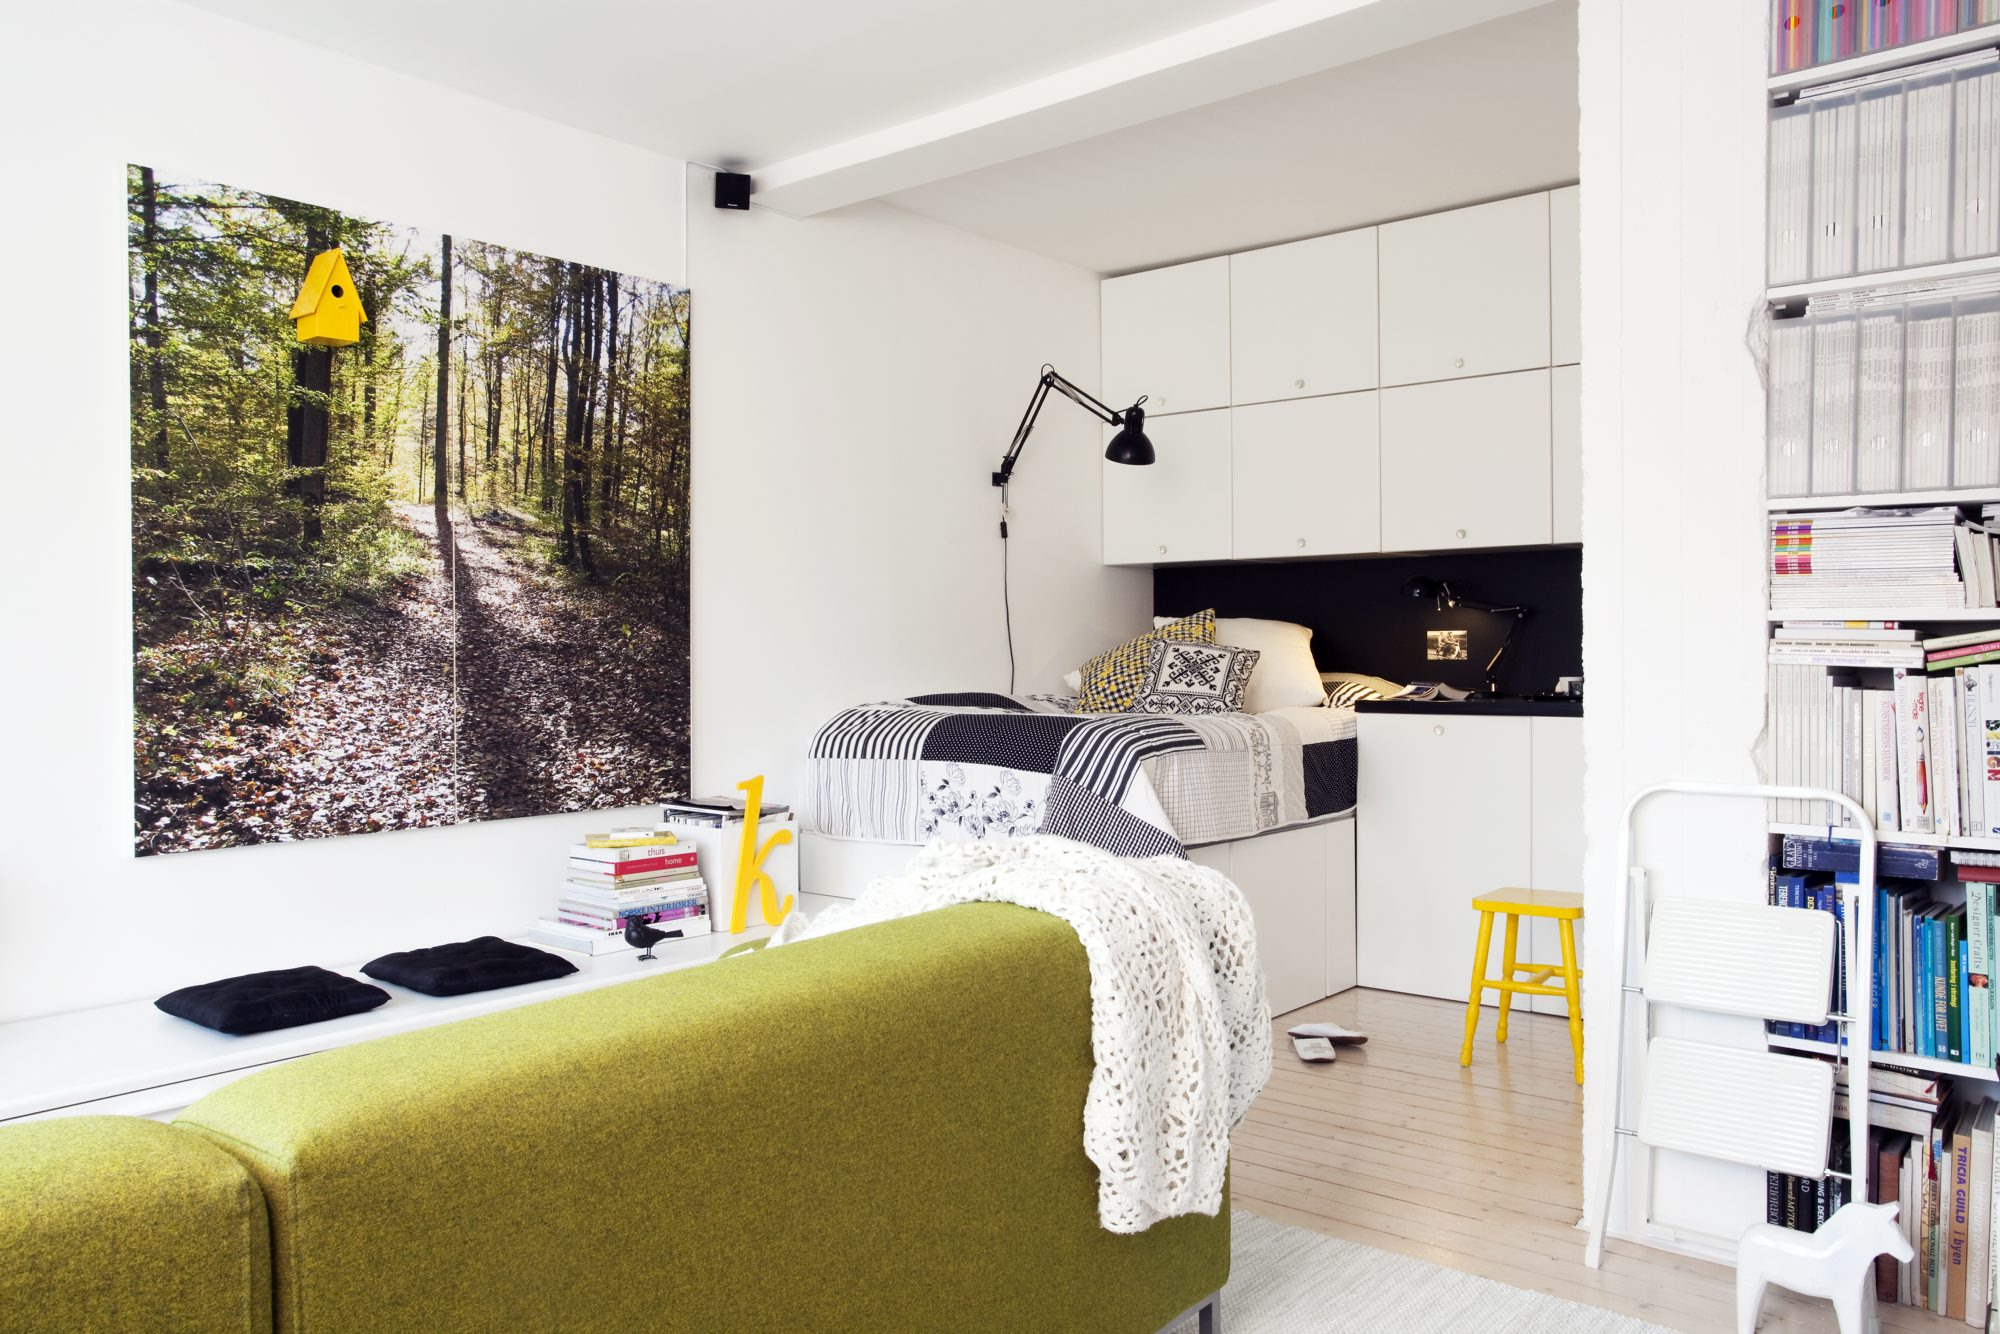 Kompakt leilighet på 40 kvadramter